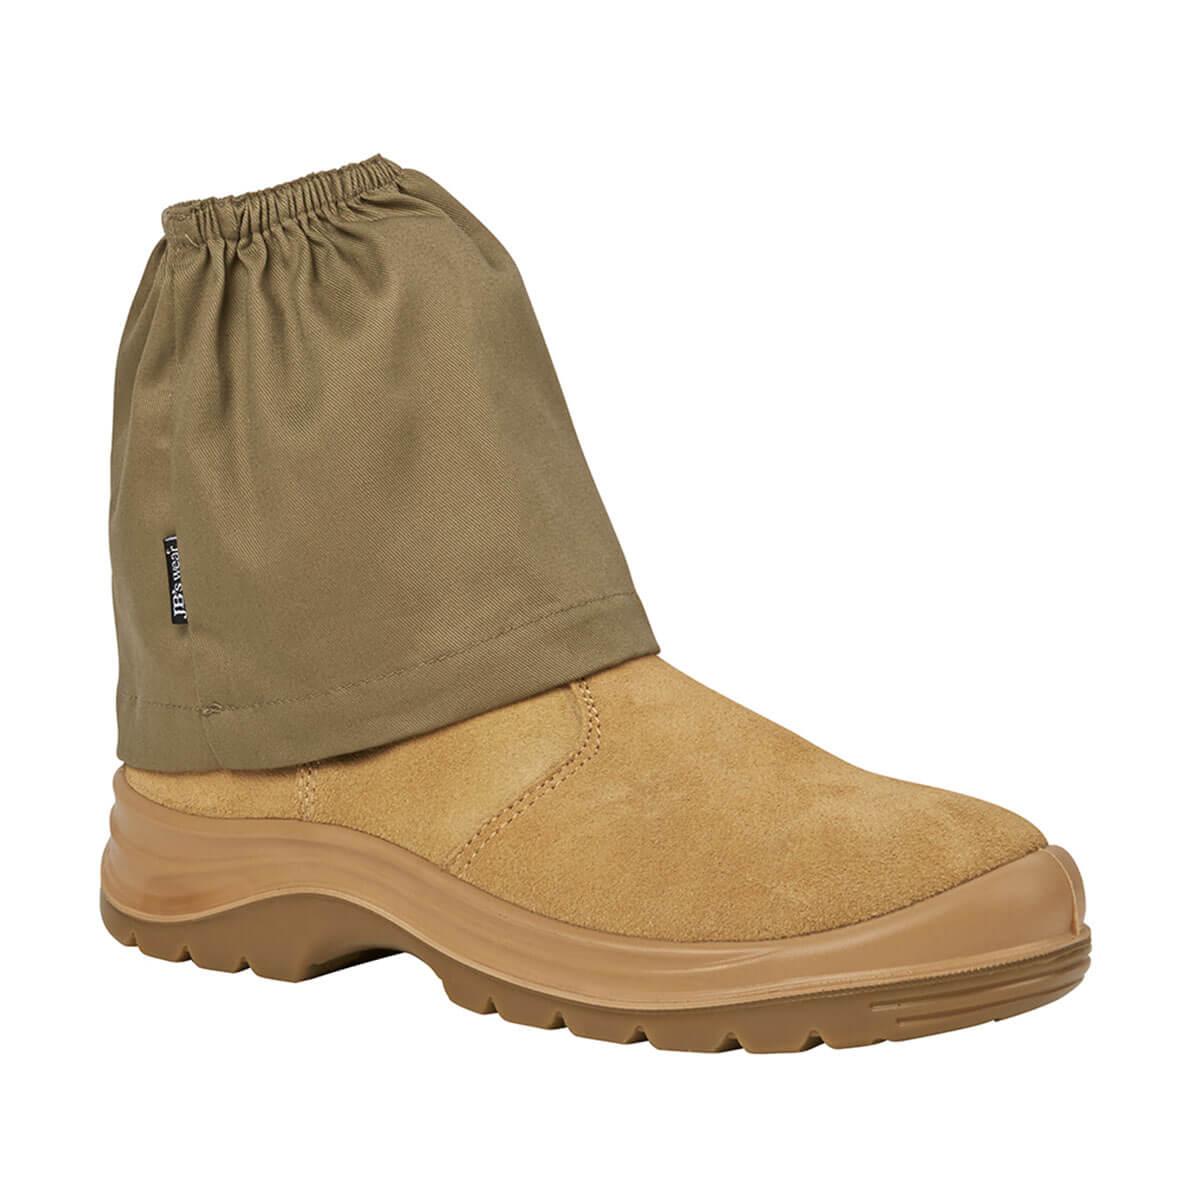 Boot Cover-Khaki